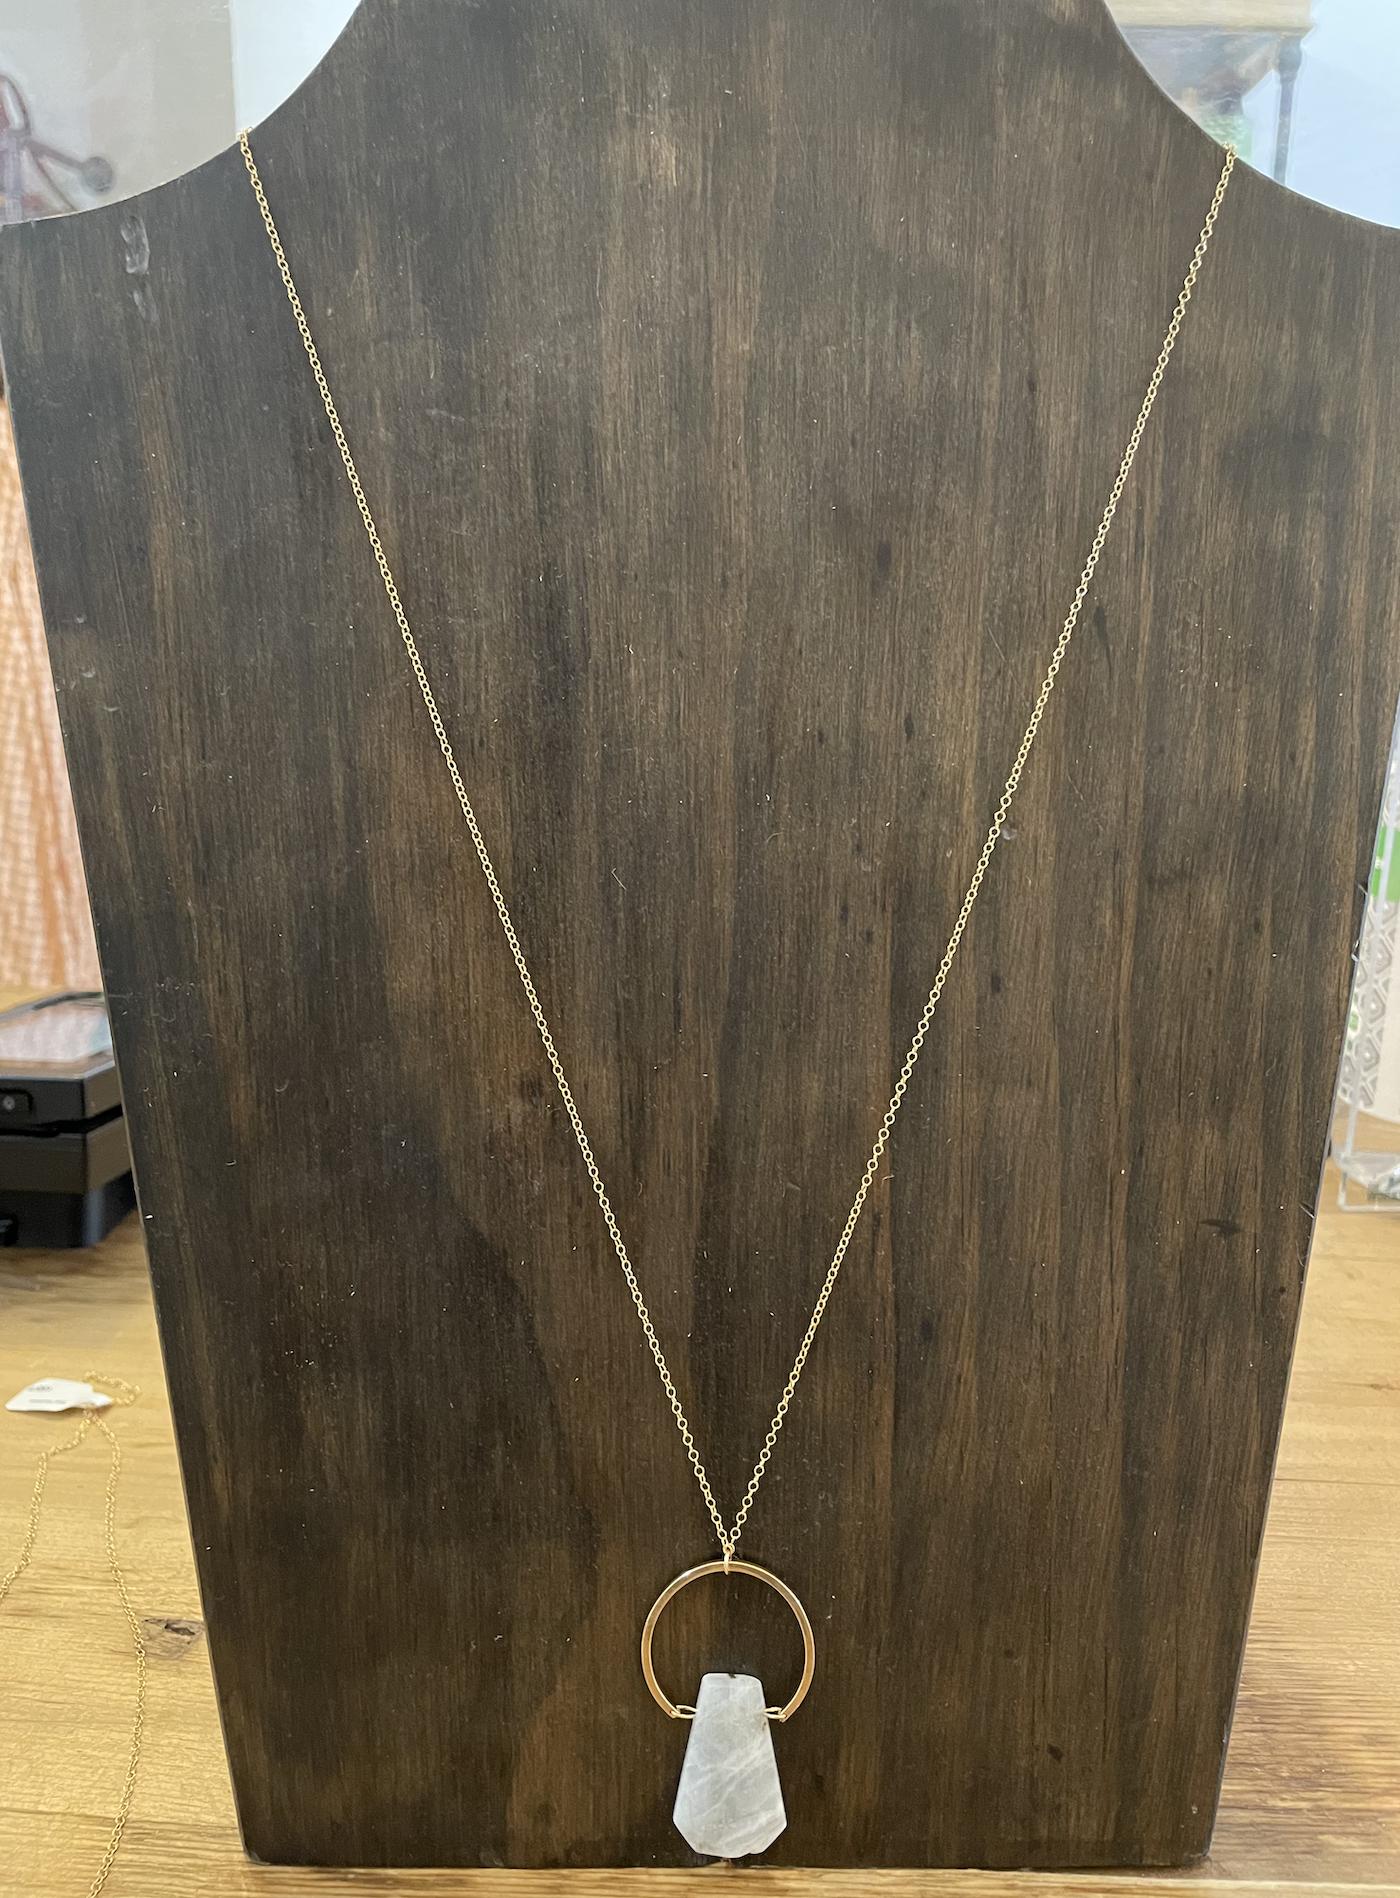 Metrix Jewelry Goldie Necklace